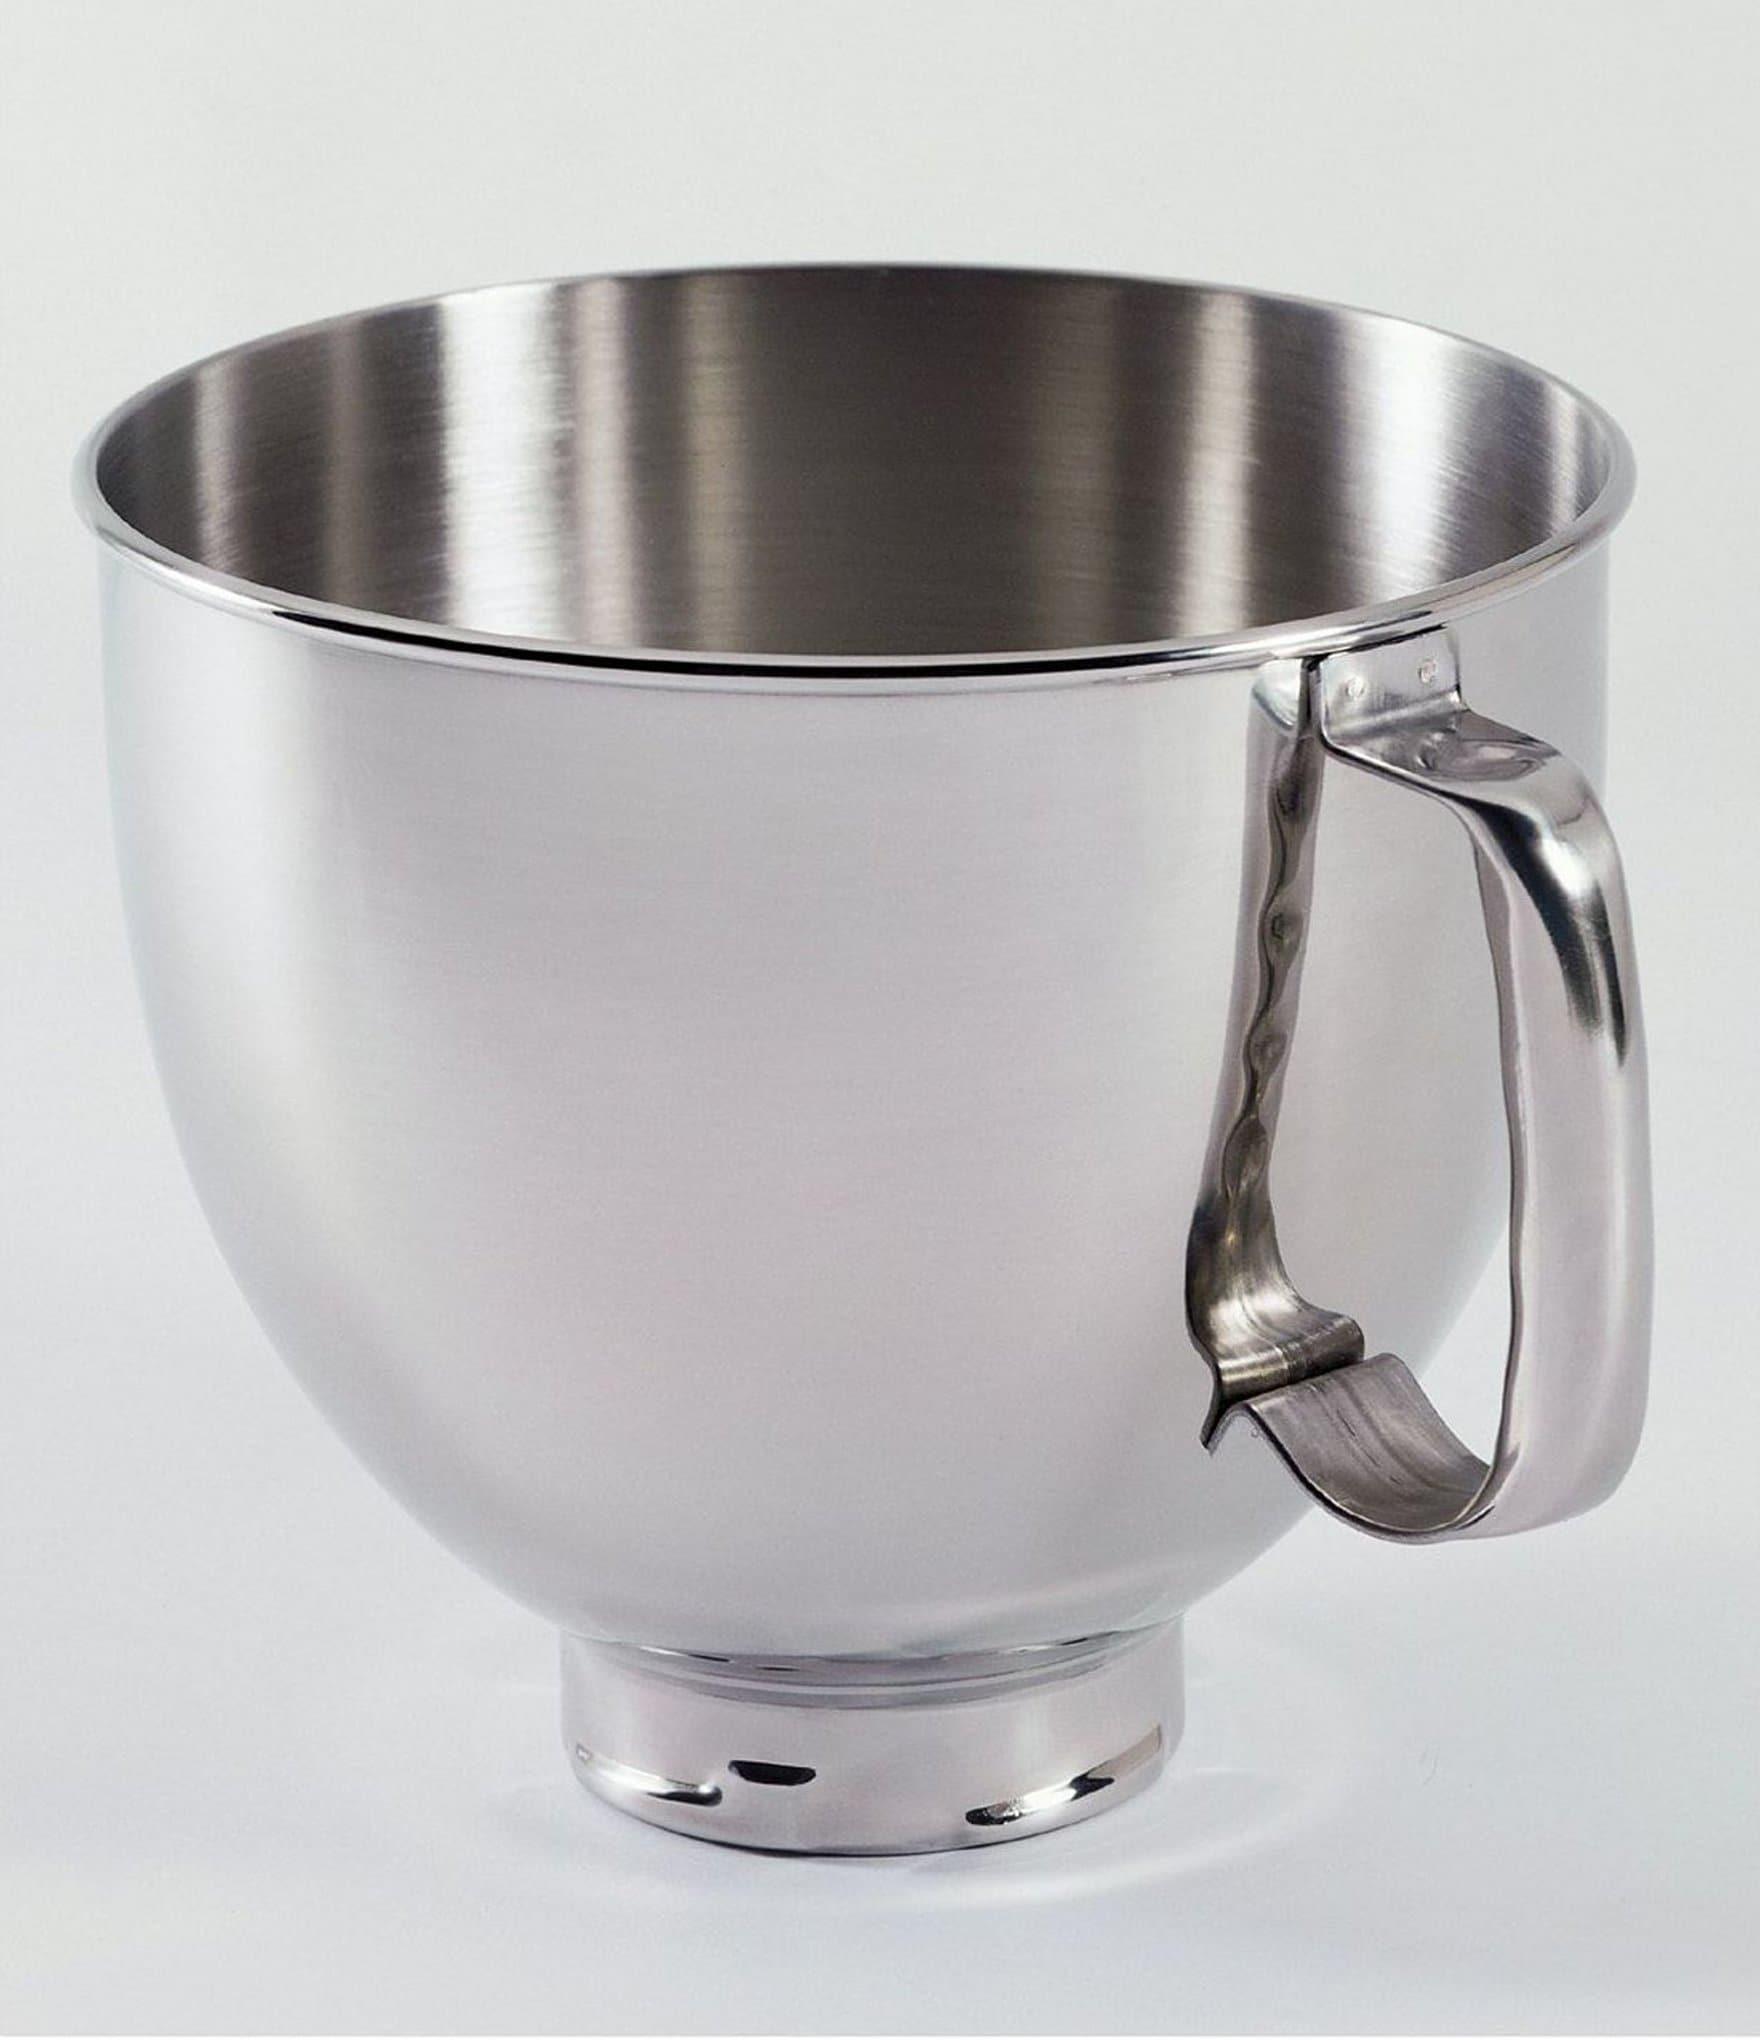 Kitchenaid 5 Quart Handled Mixing Bowl Artisan Stand Mixer